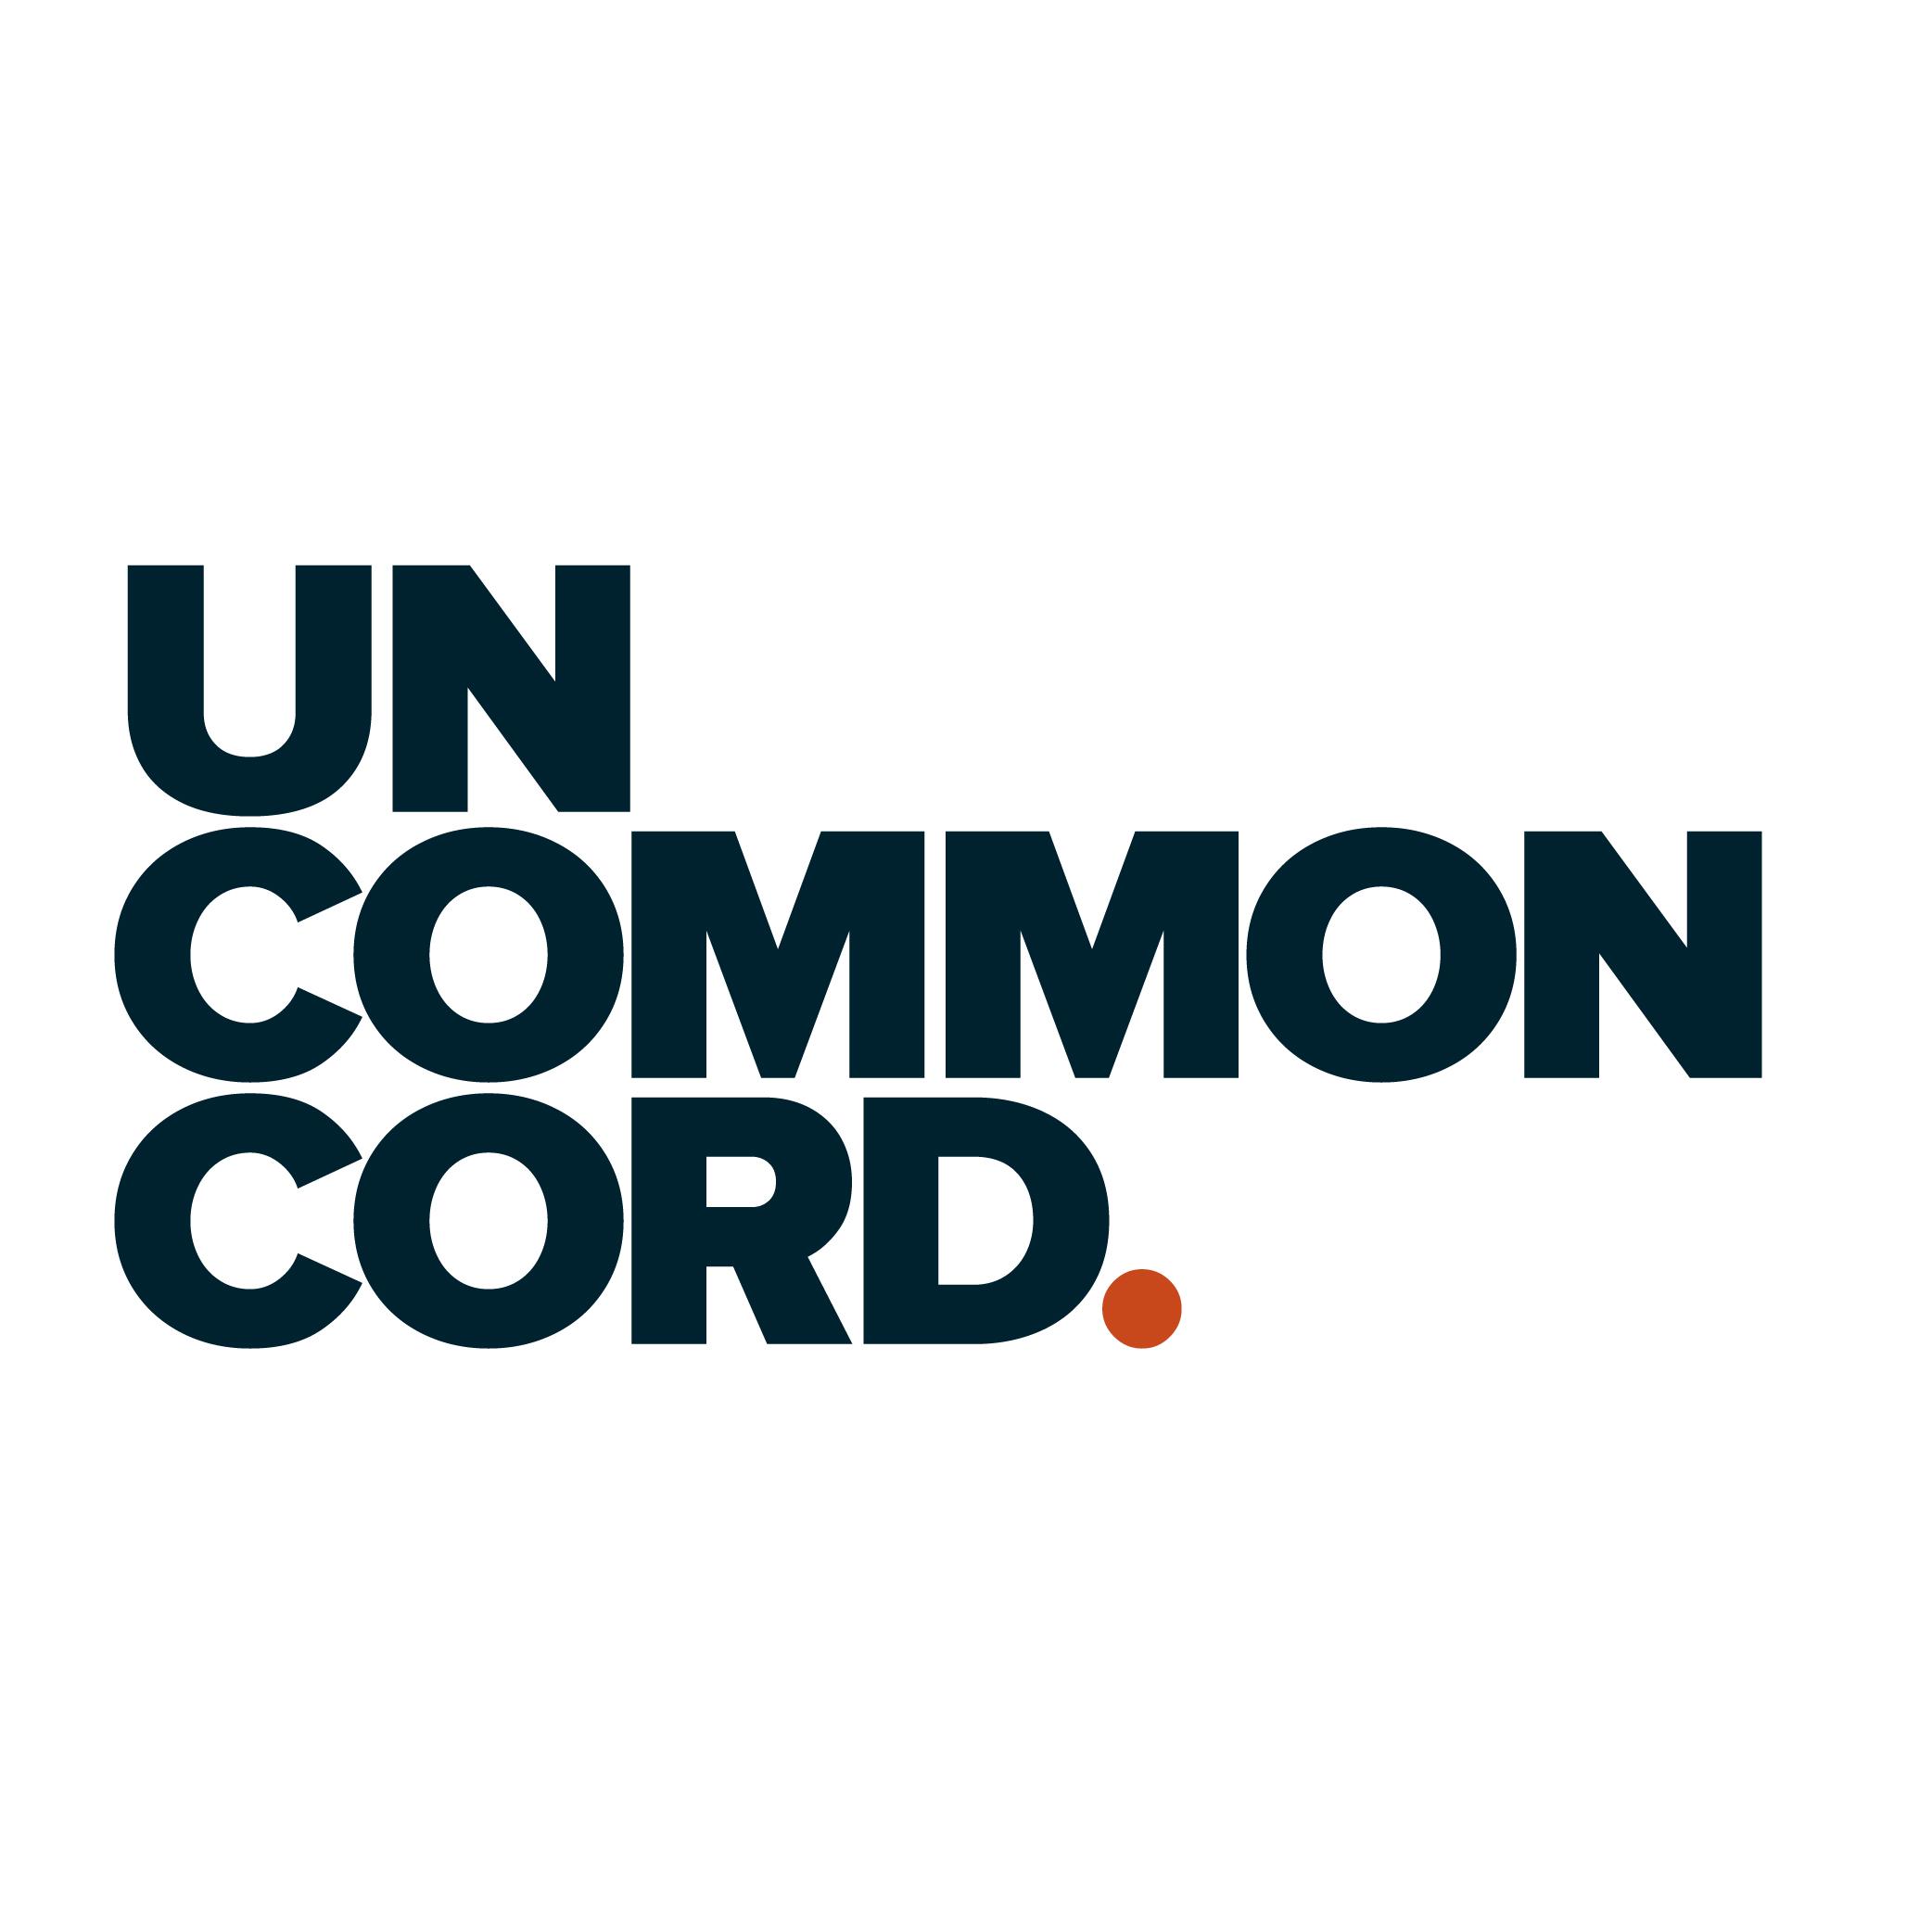 Uncommon Cord   BRAND DEVELOPMENT | WEBSITE DEVELOPMENT | BRANDING COLLATERAL | PHOTOGRAPHY